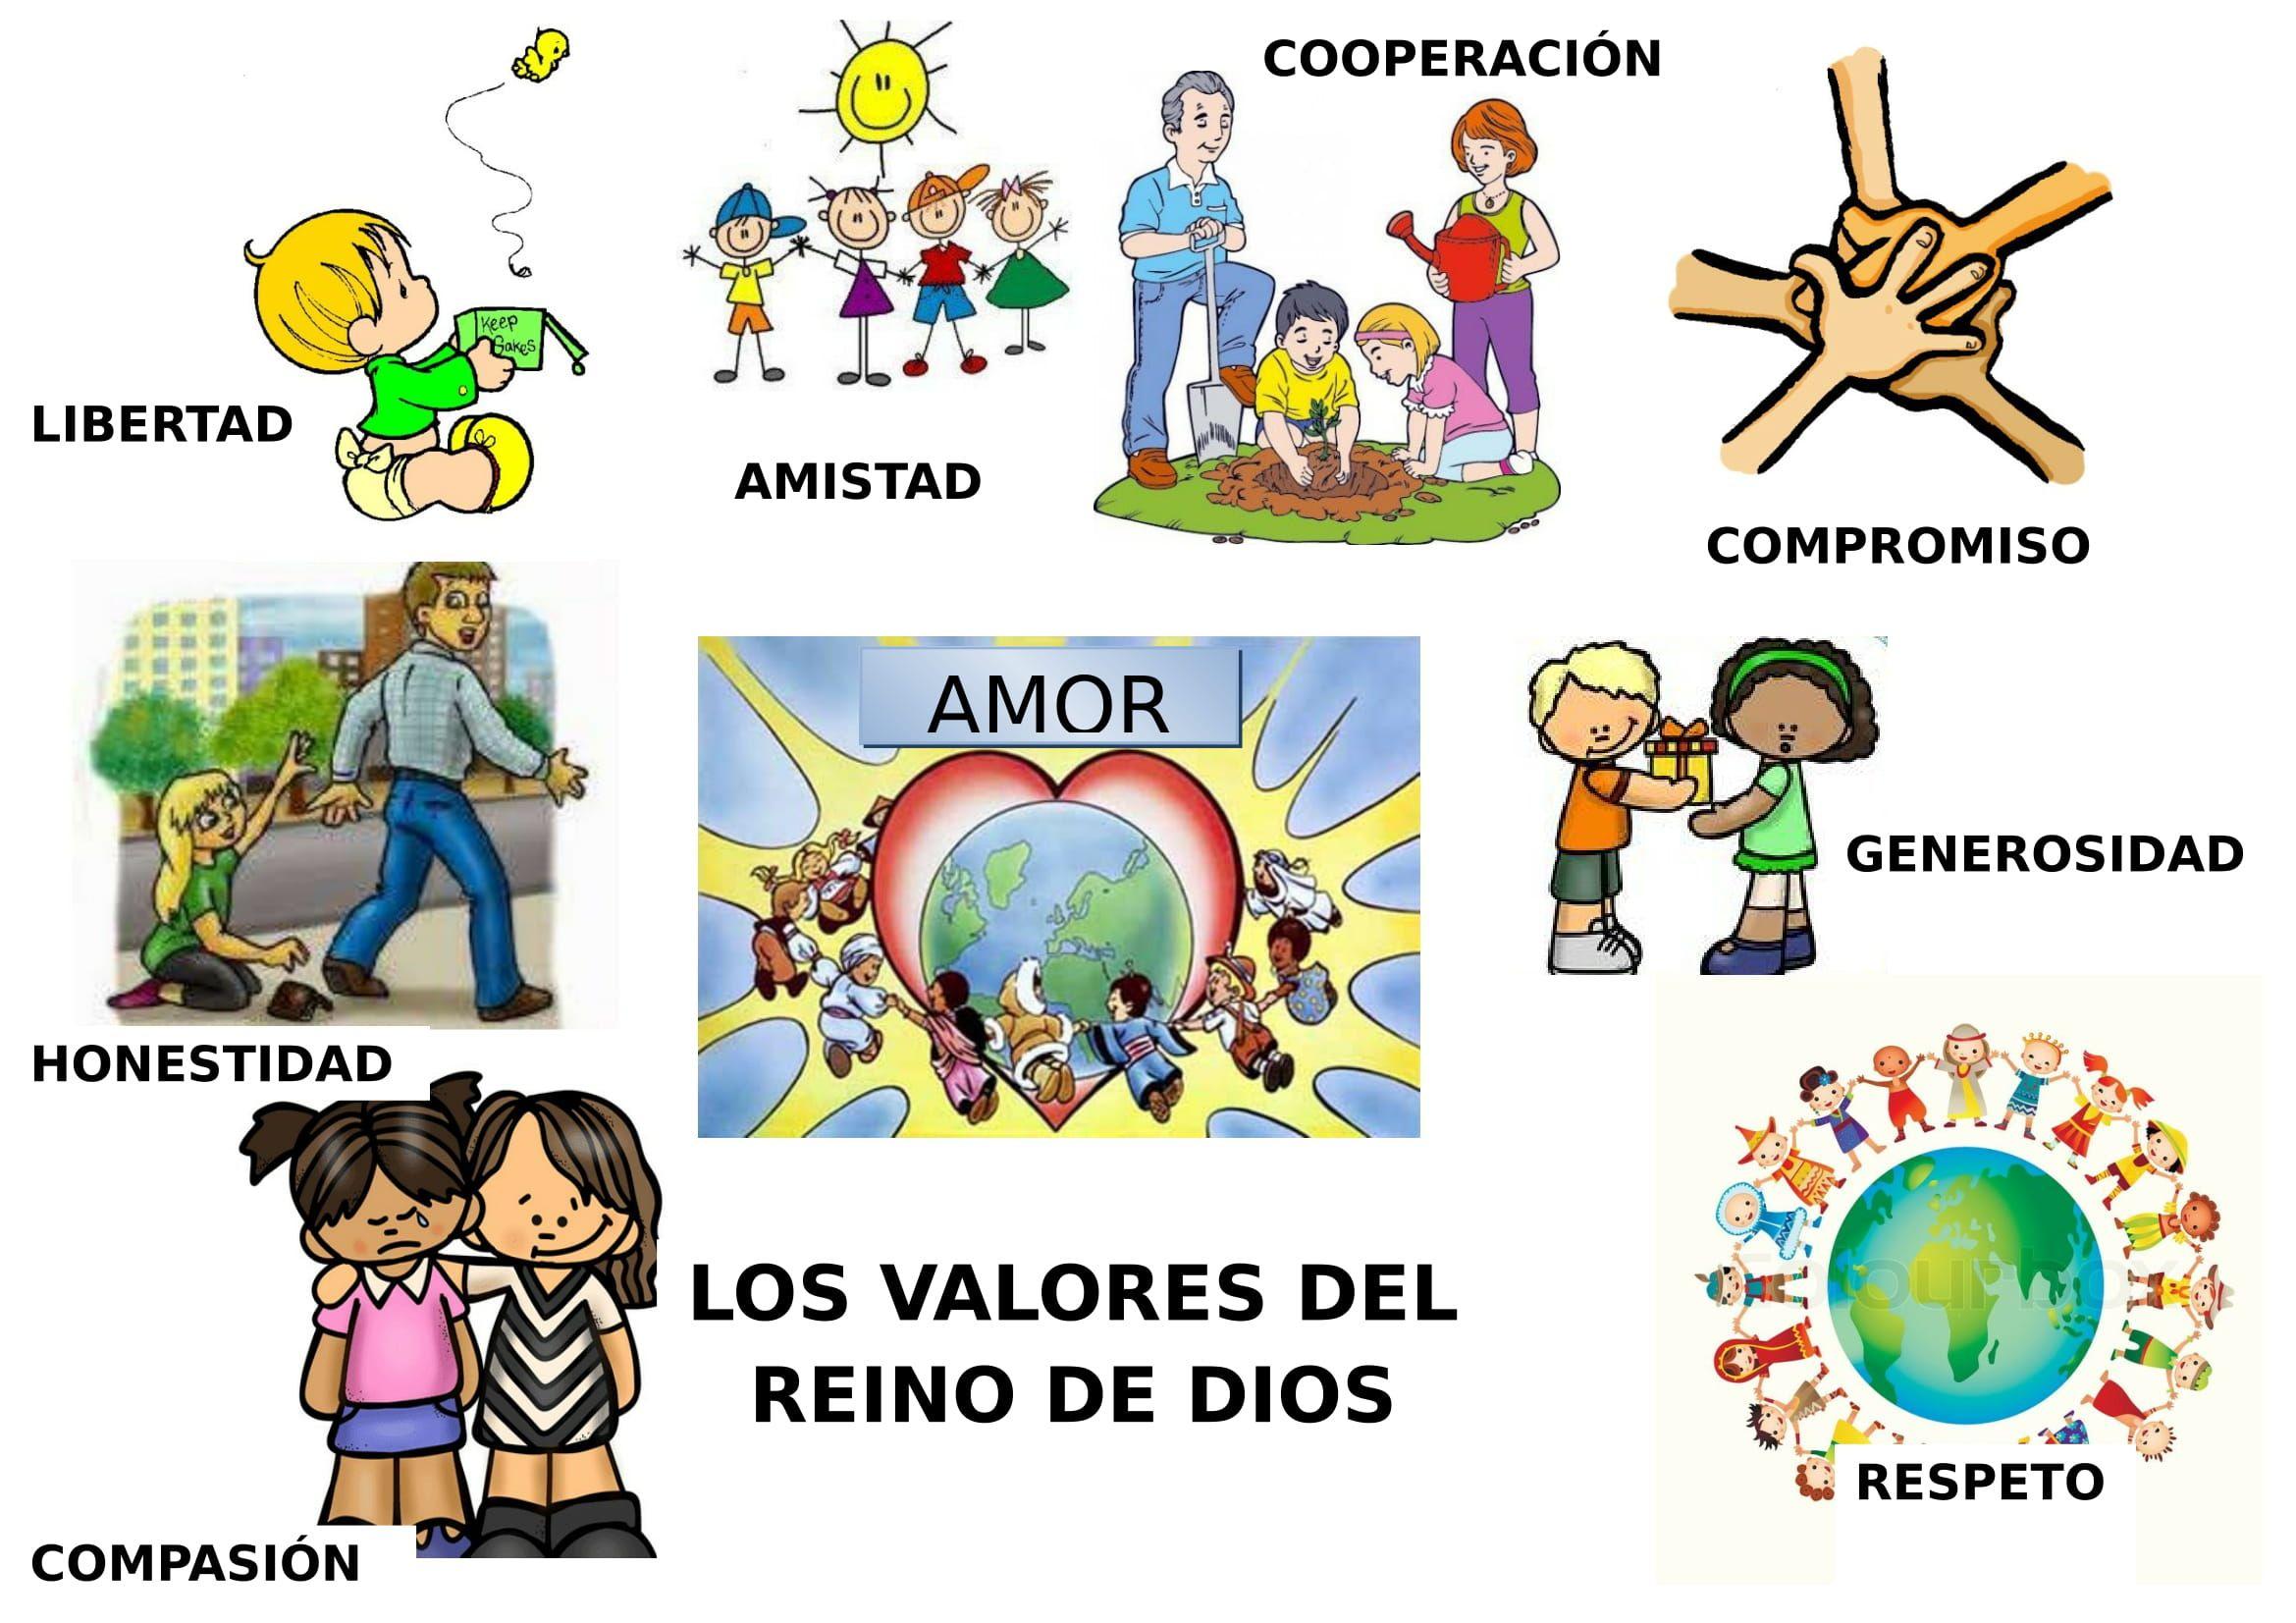 Valores Del Reino De Dios Educacion De Valores Dios Catecismo